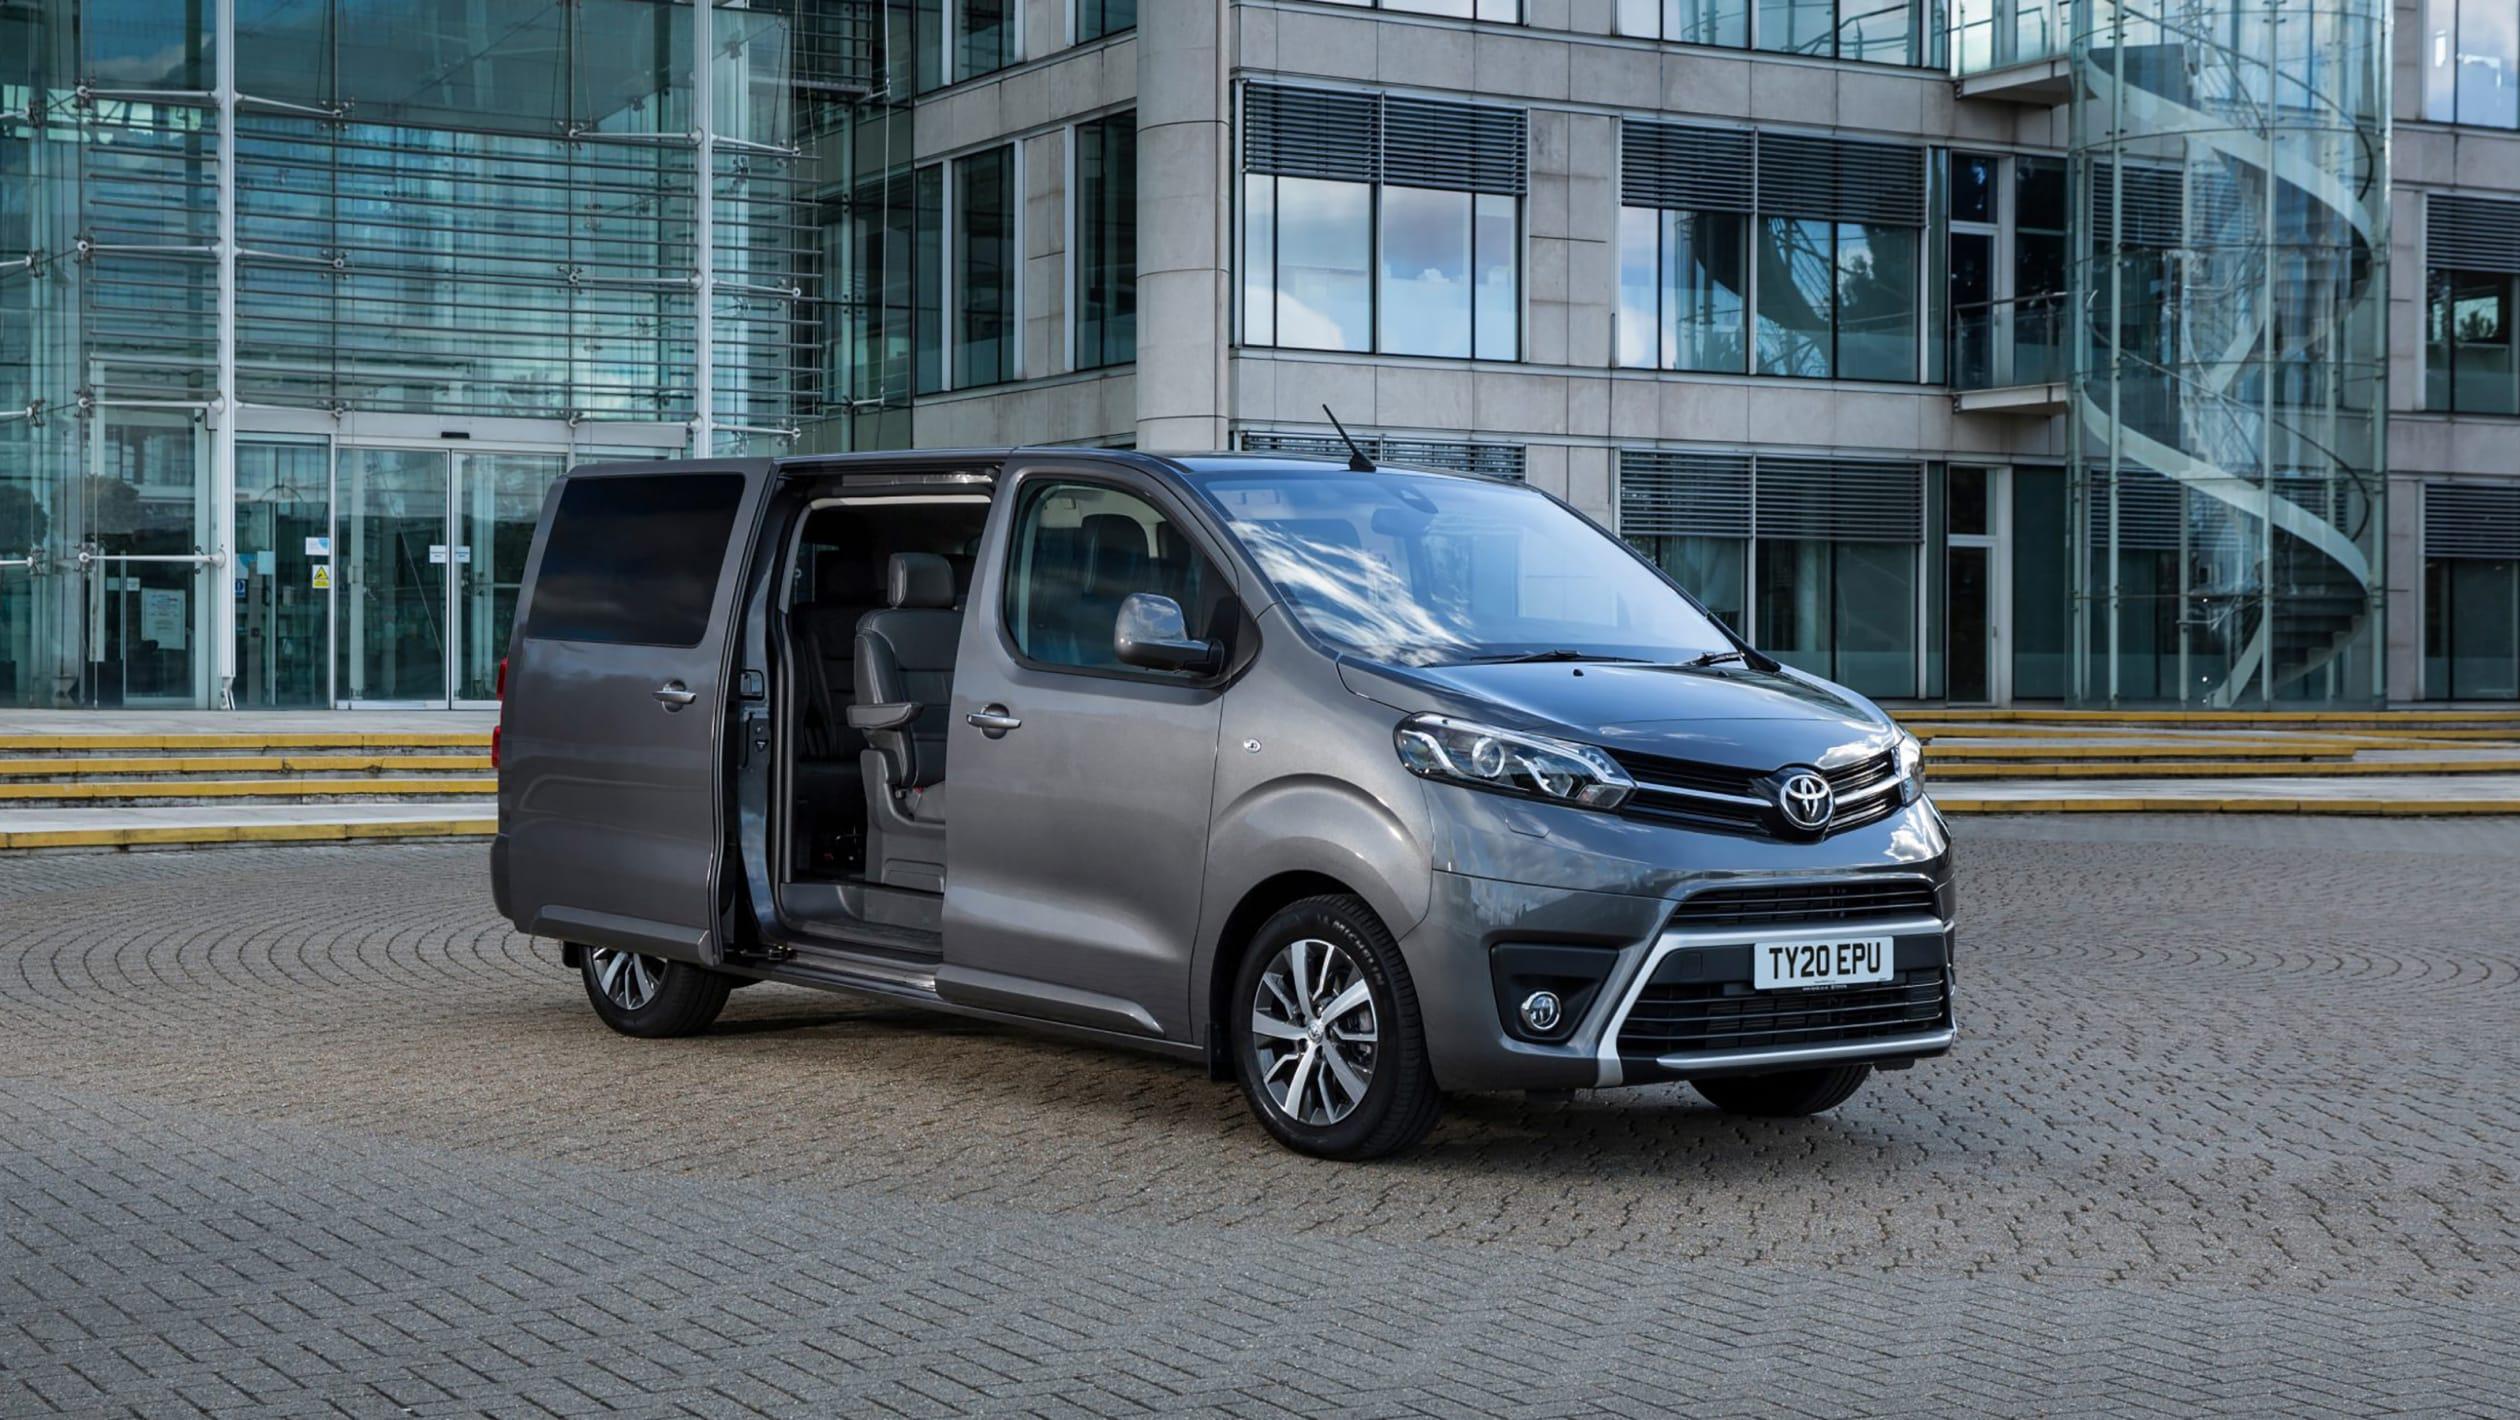 2016 - [Citroën/Peugeot/Toyota] SpaceTourer/Traveller/ProAce - Page 40 Toyota%20Proace-3